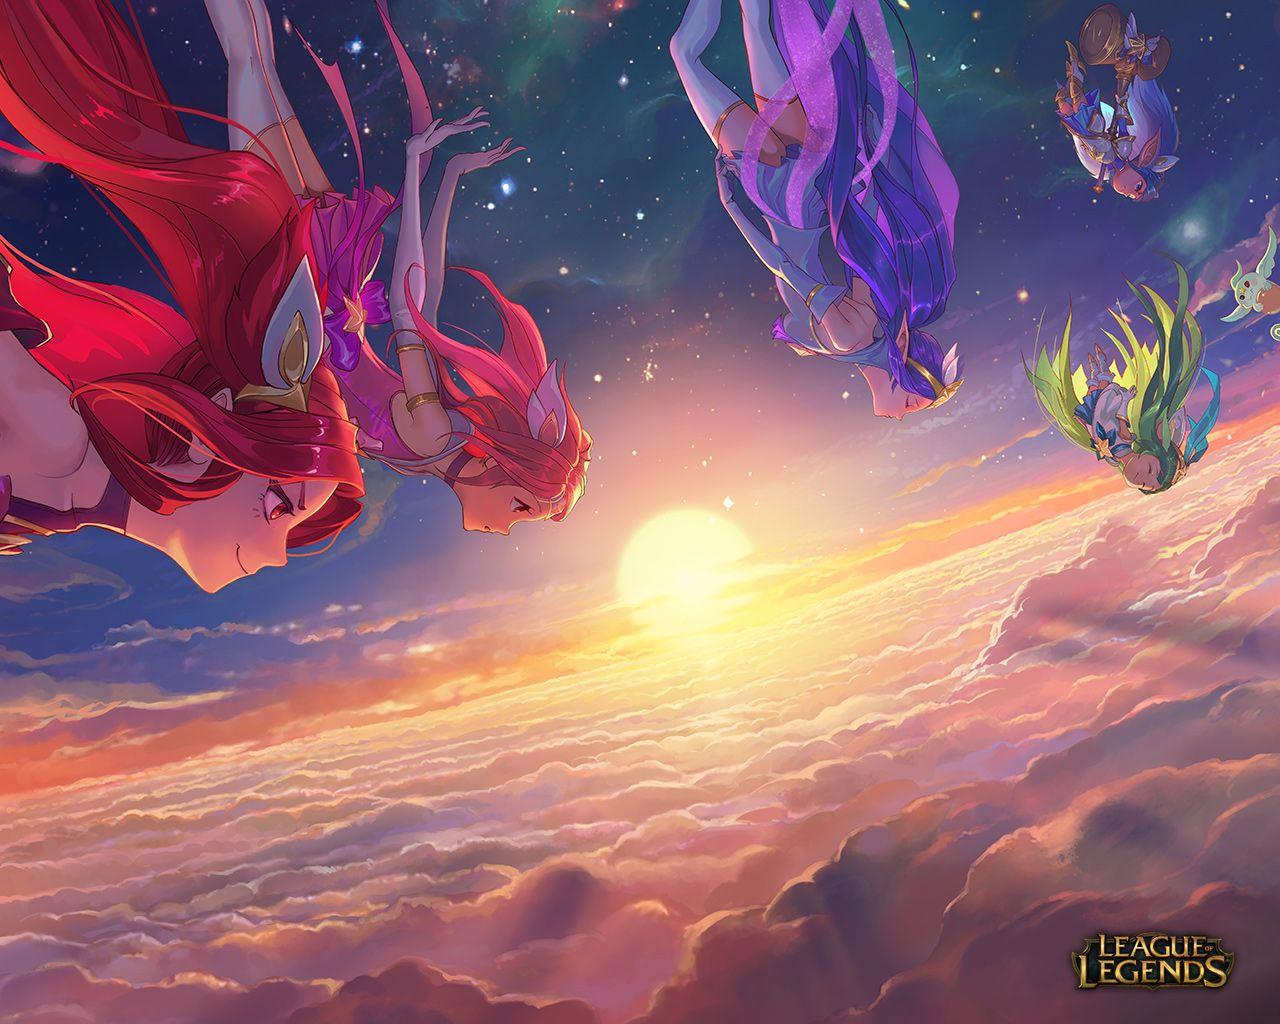 1280x1024 Jpg 1280 1024 Star Guardian Skins Star Guardian Jinx League Of Legends